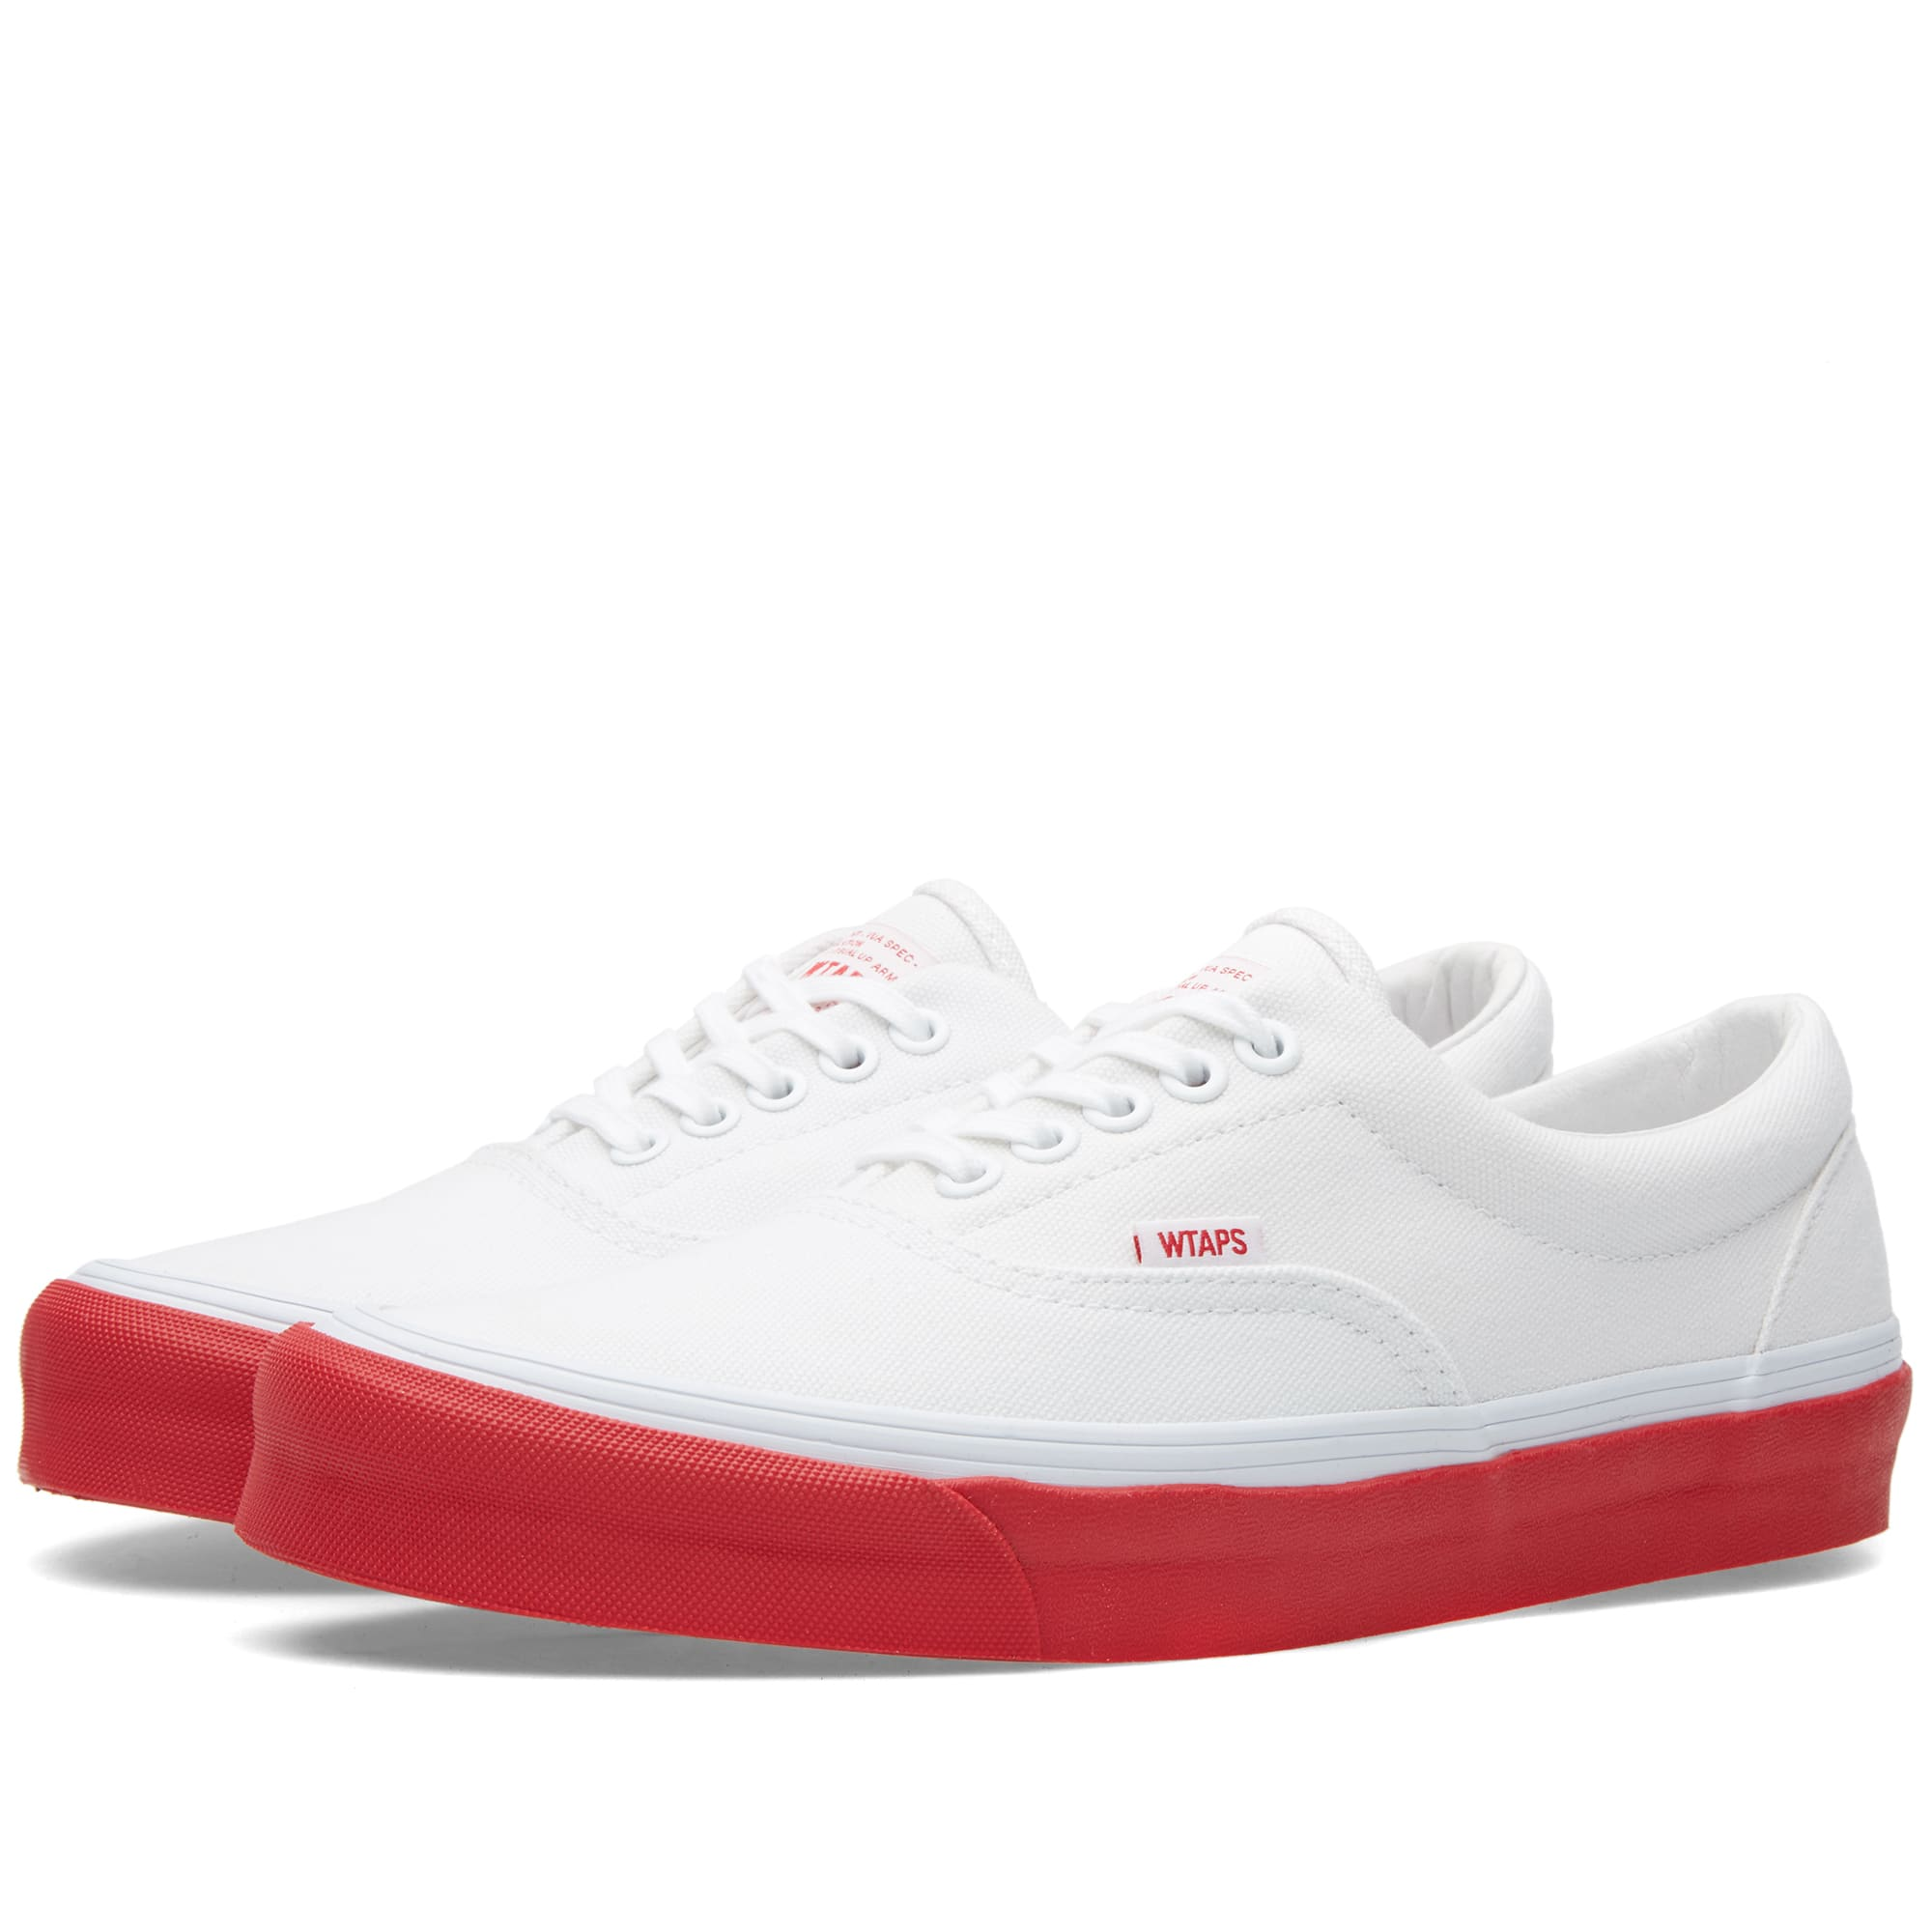 18214d384670a1 Vans Vault x WTAPS OG Era LX White   Red